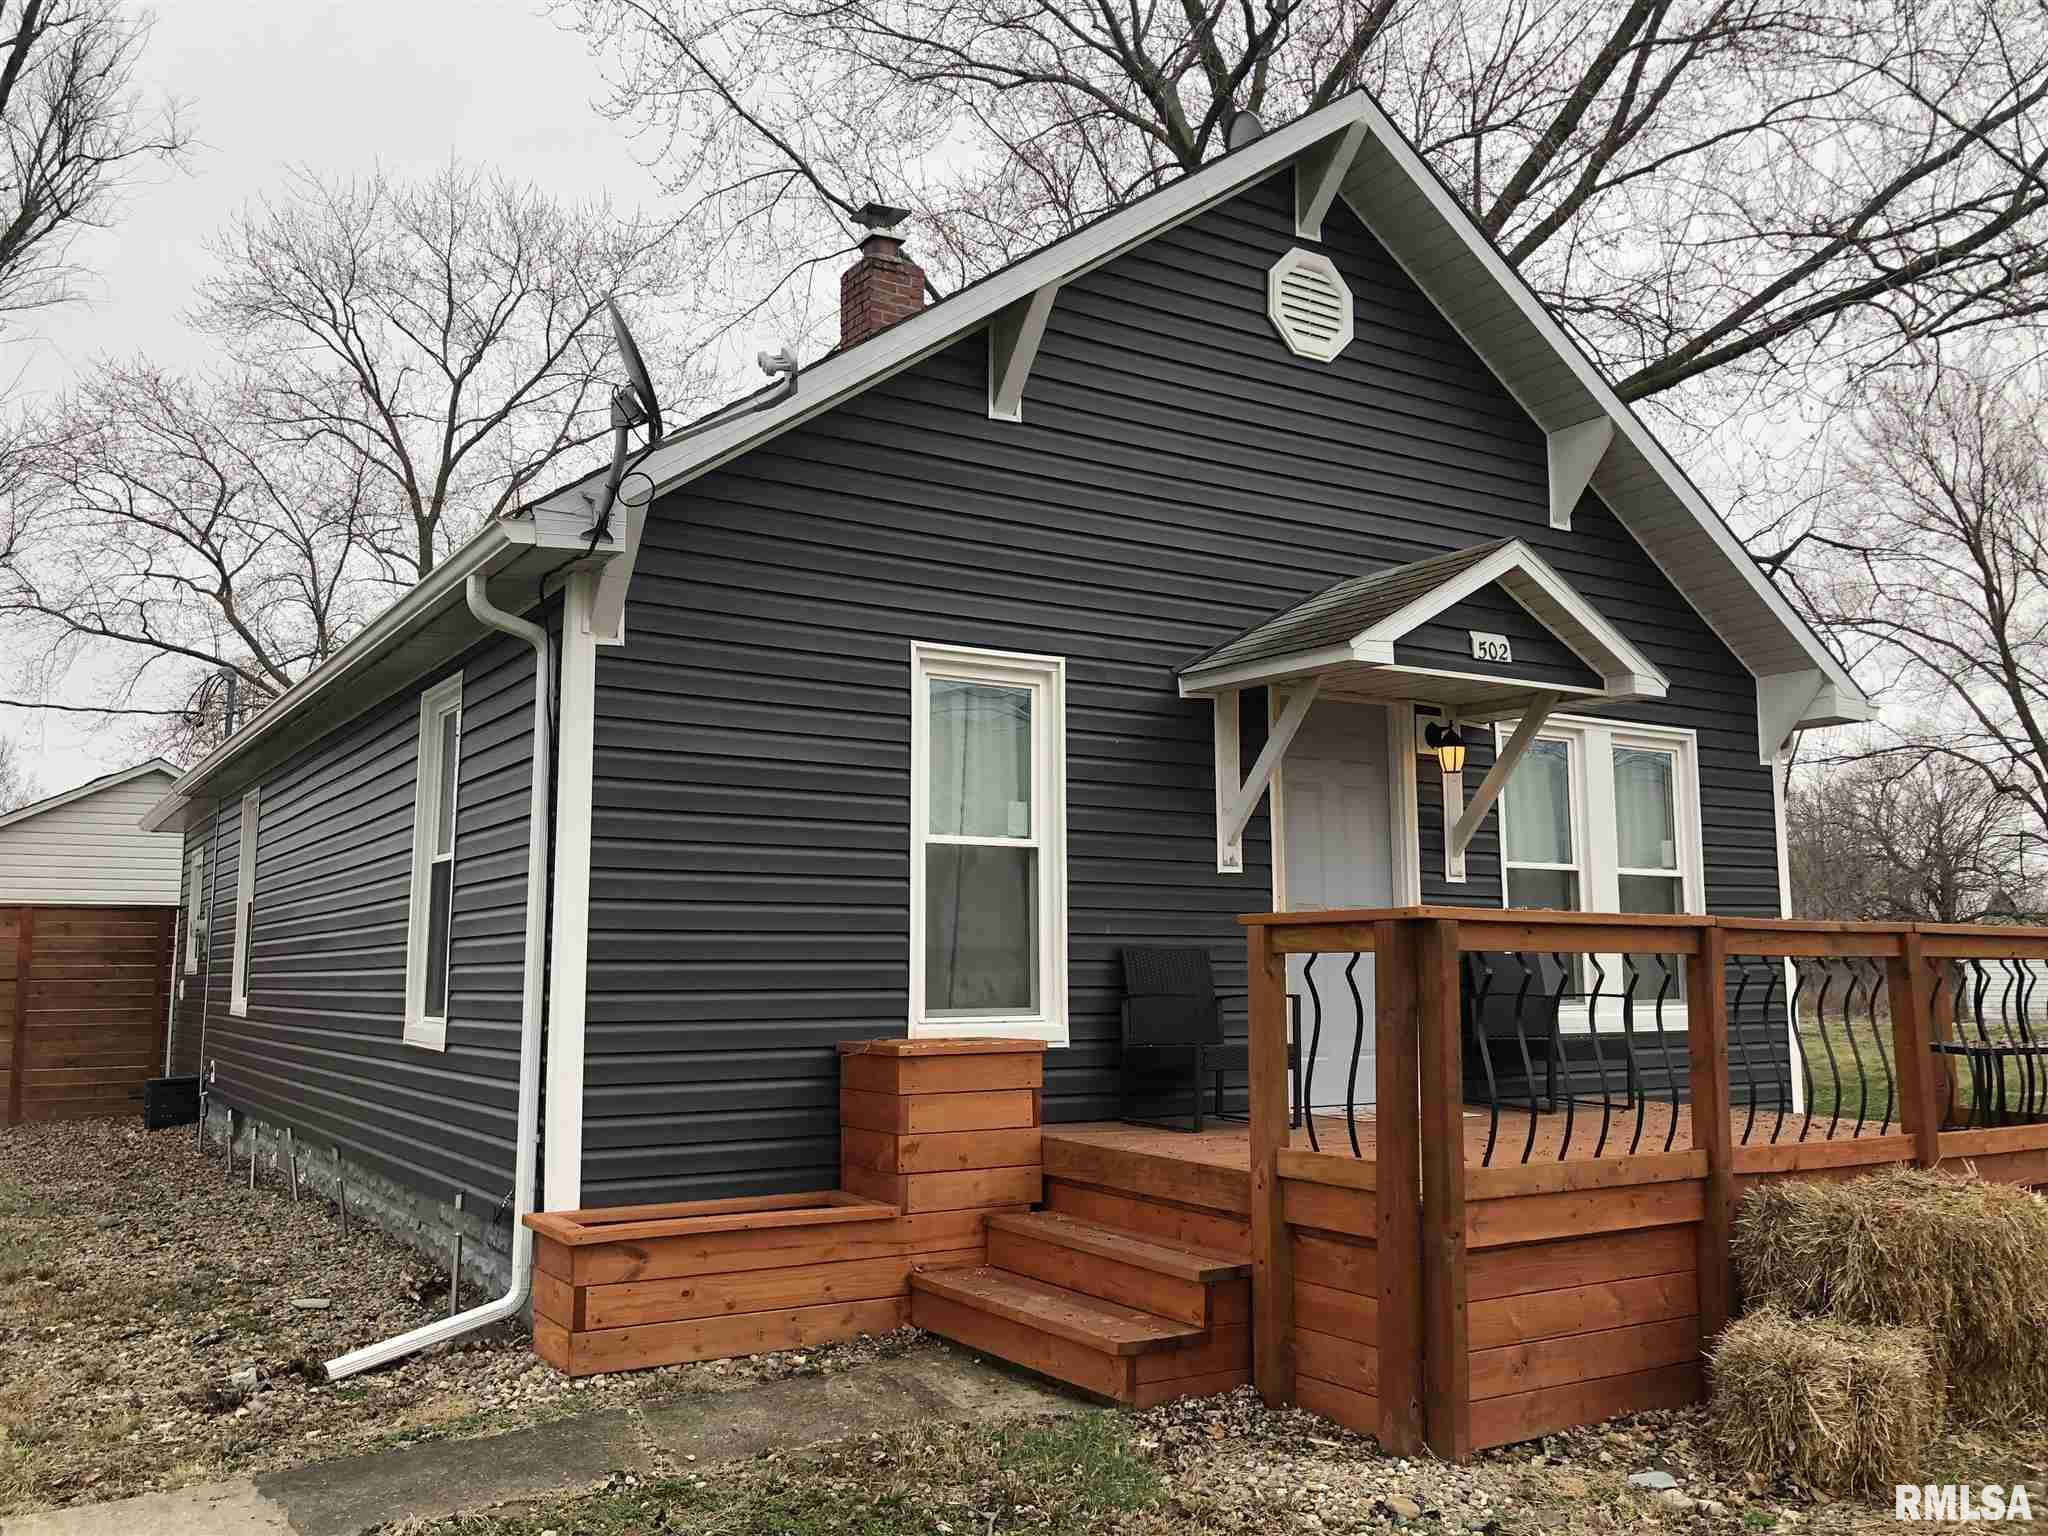 502 S OAK Property Photo - Patoka, IL real estate listing